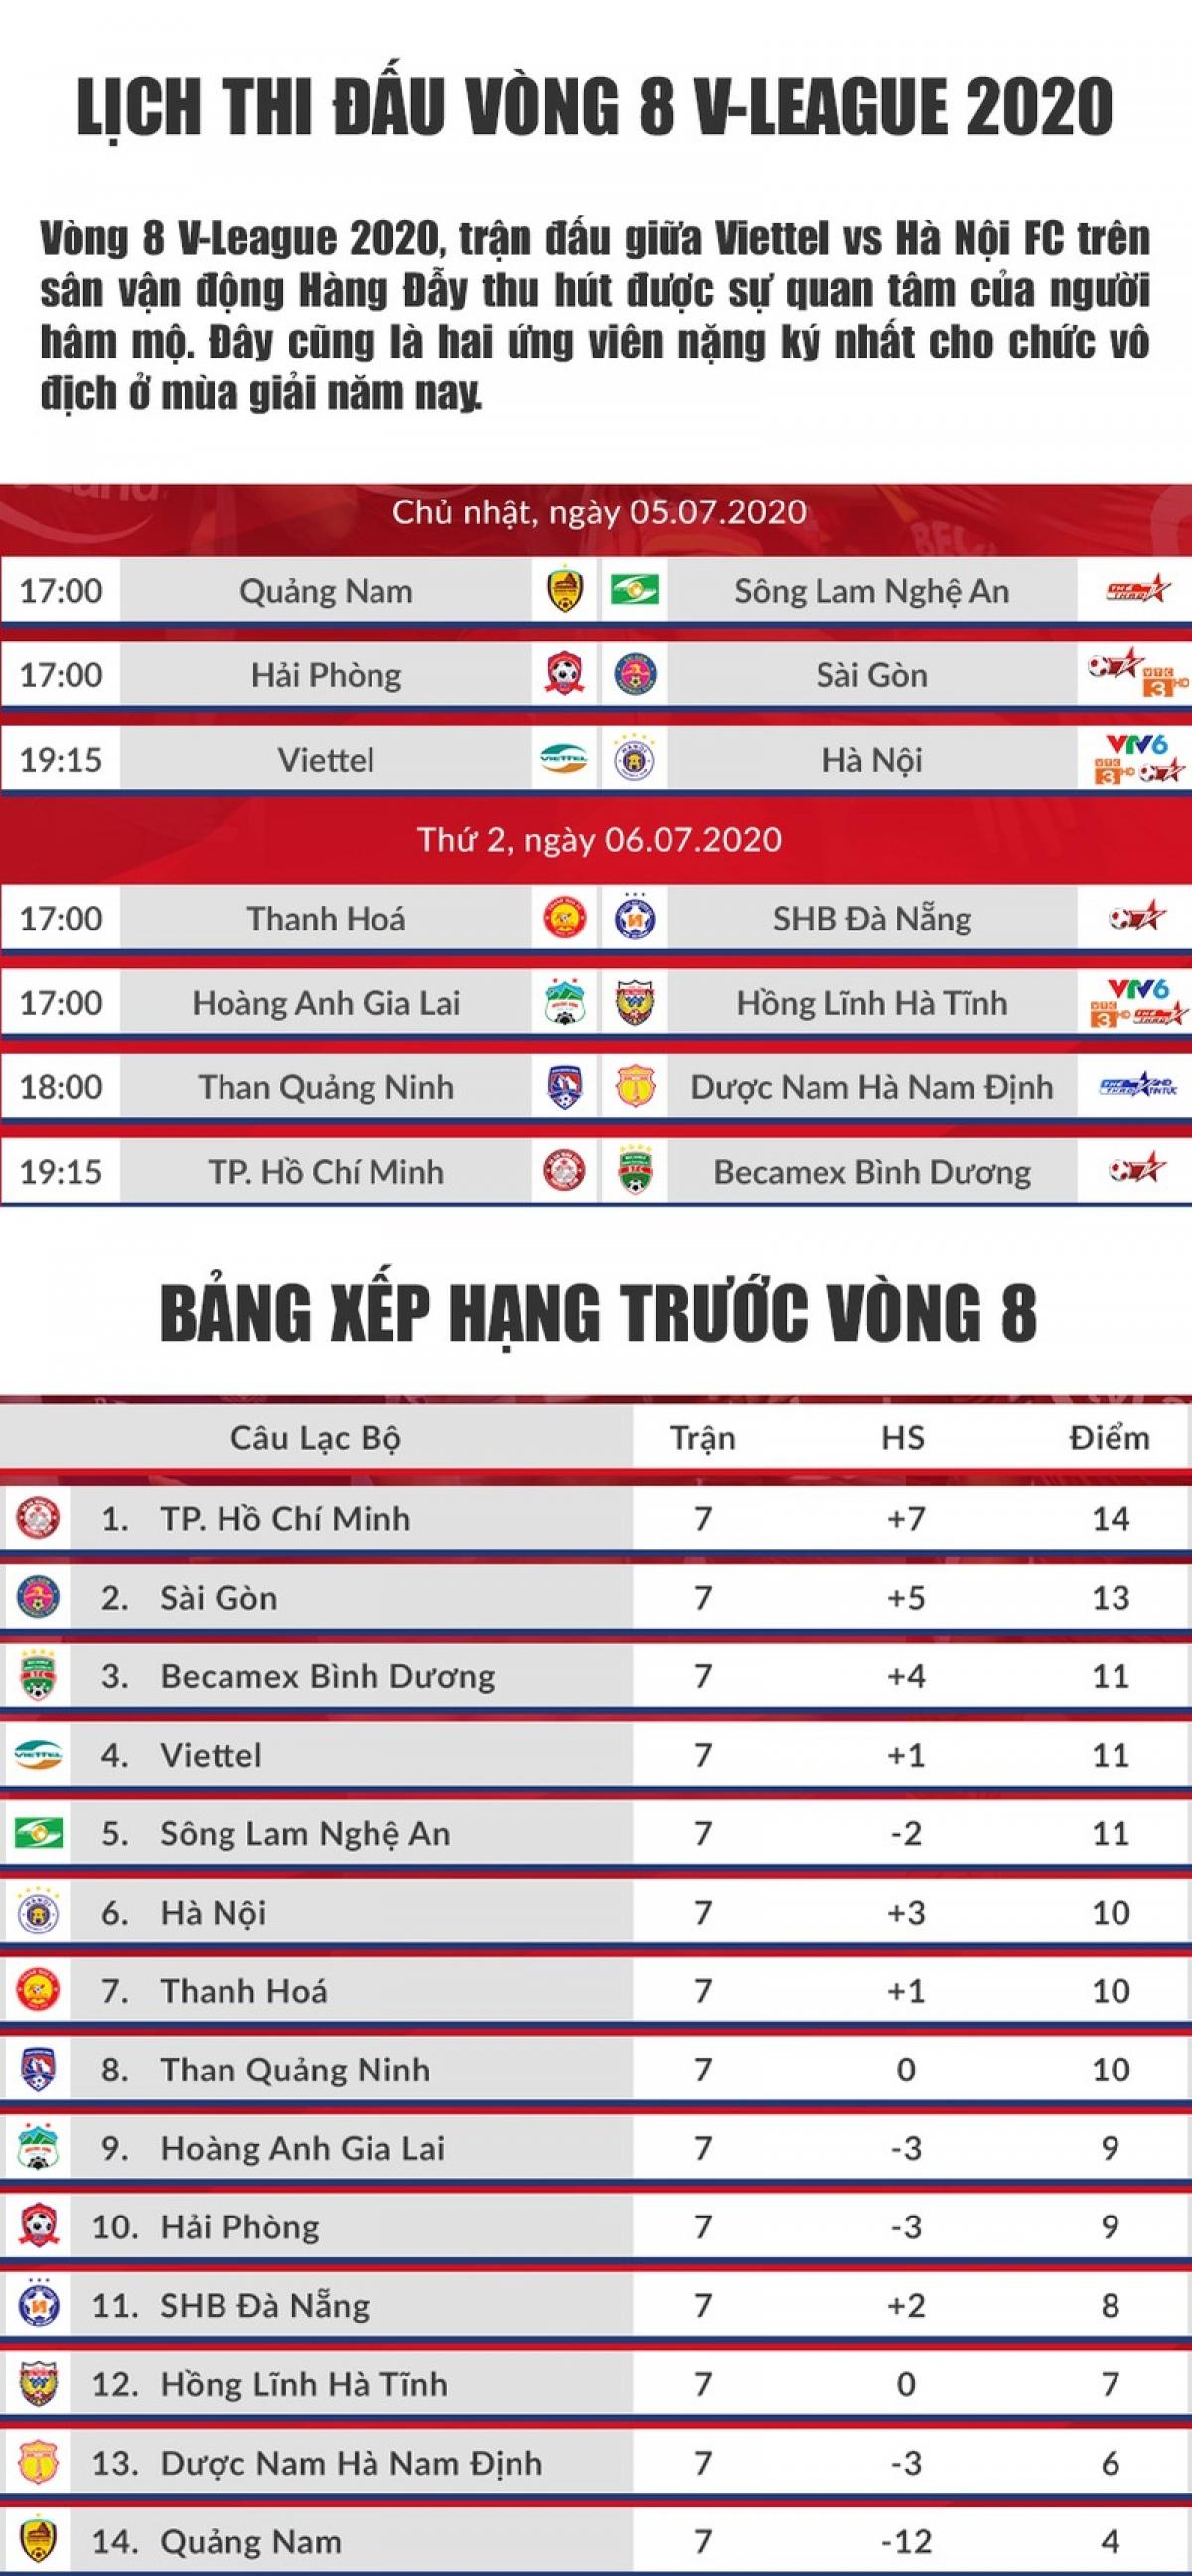 lich_thi_dau_vong_8_v_league_2020_viettel_vs_ha_noi_fc_ufoj.jpg